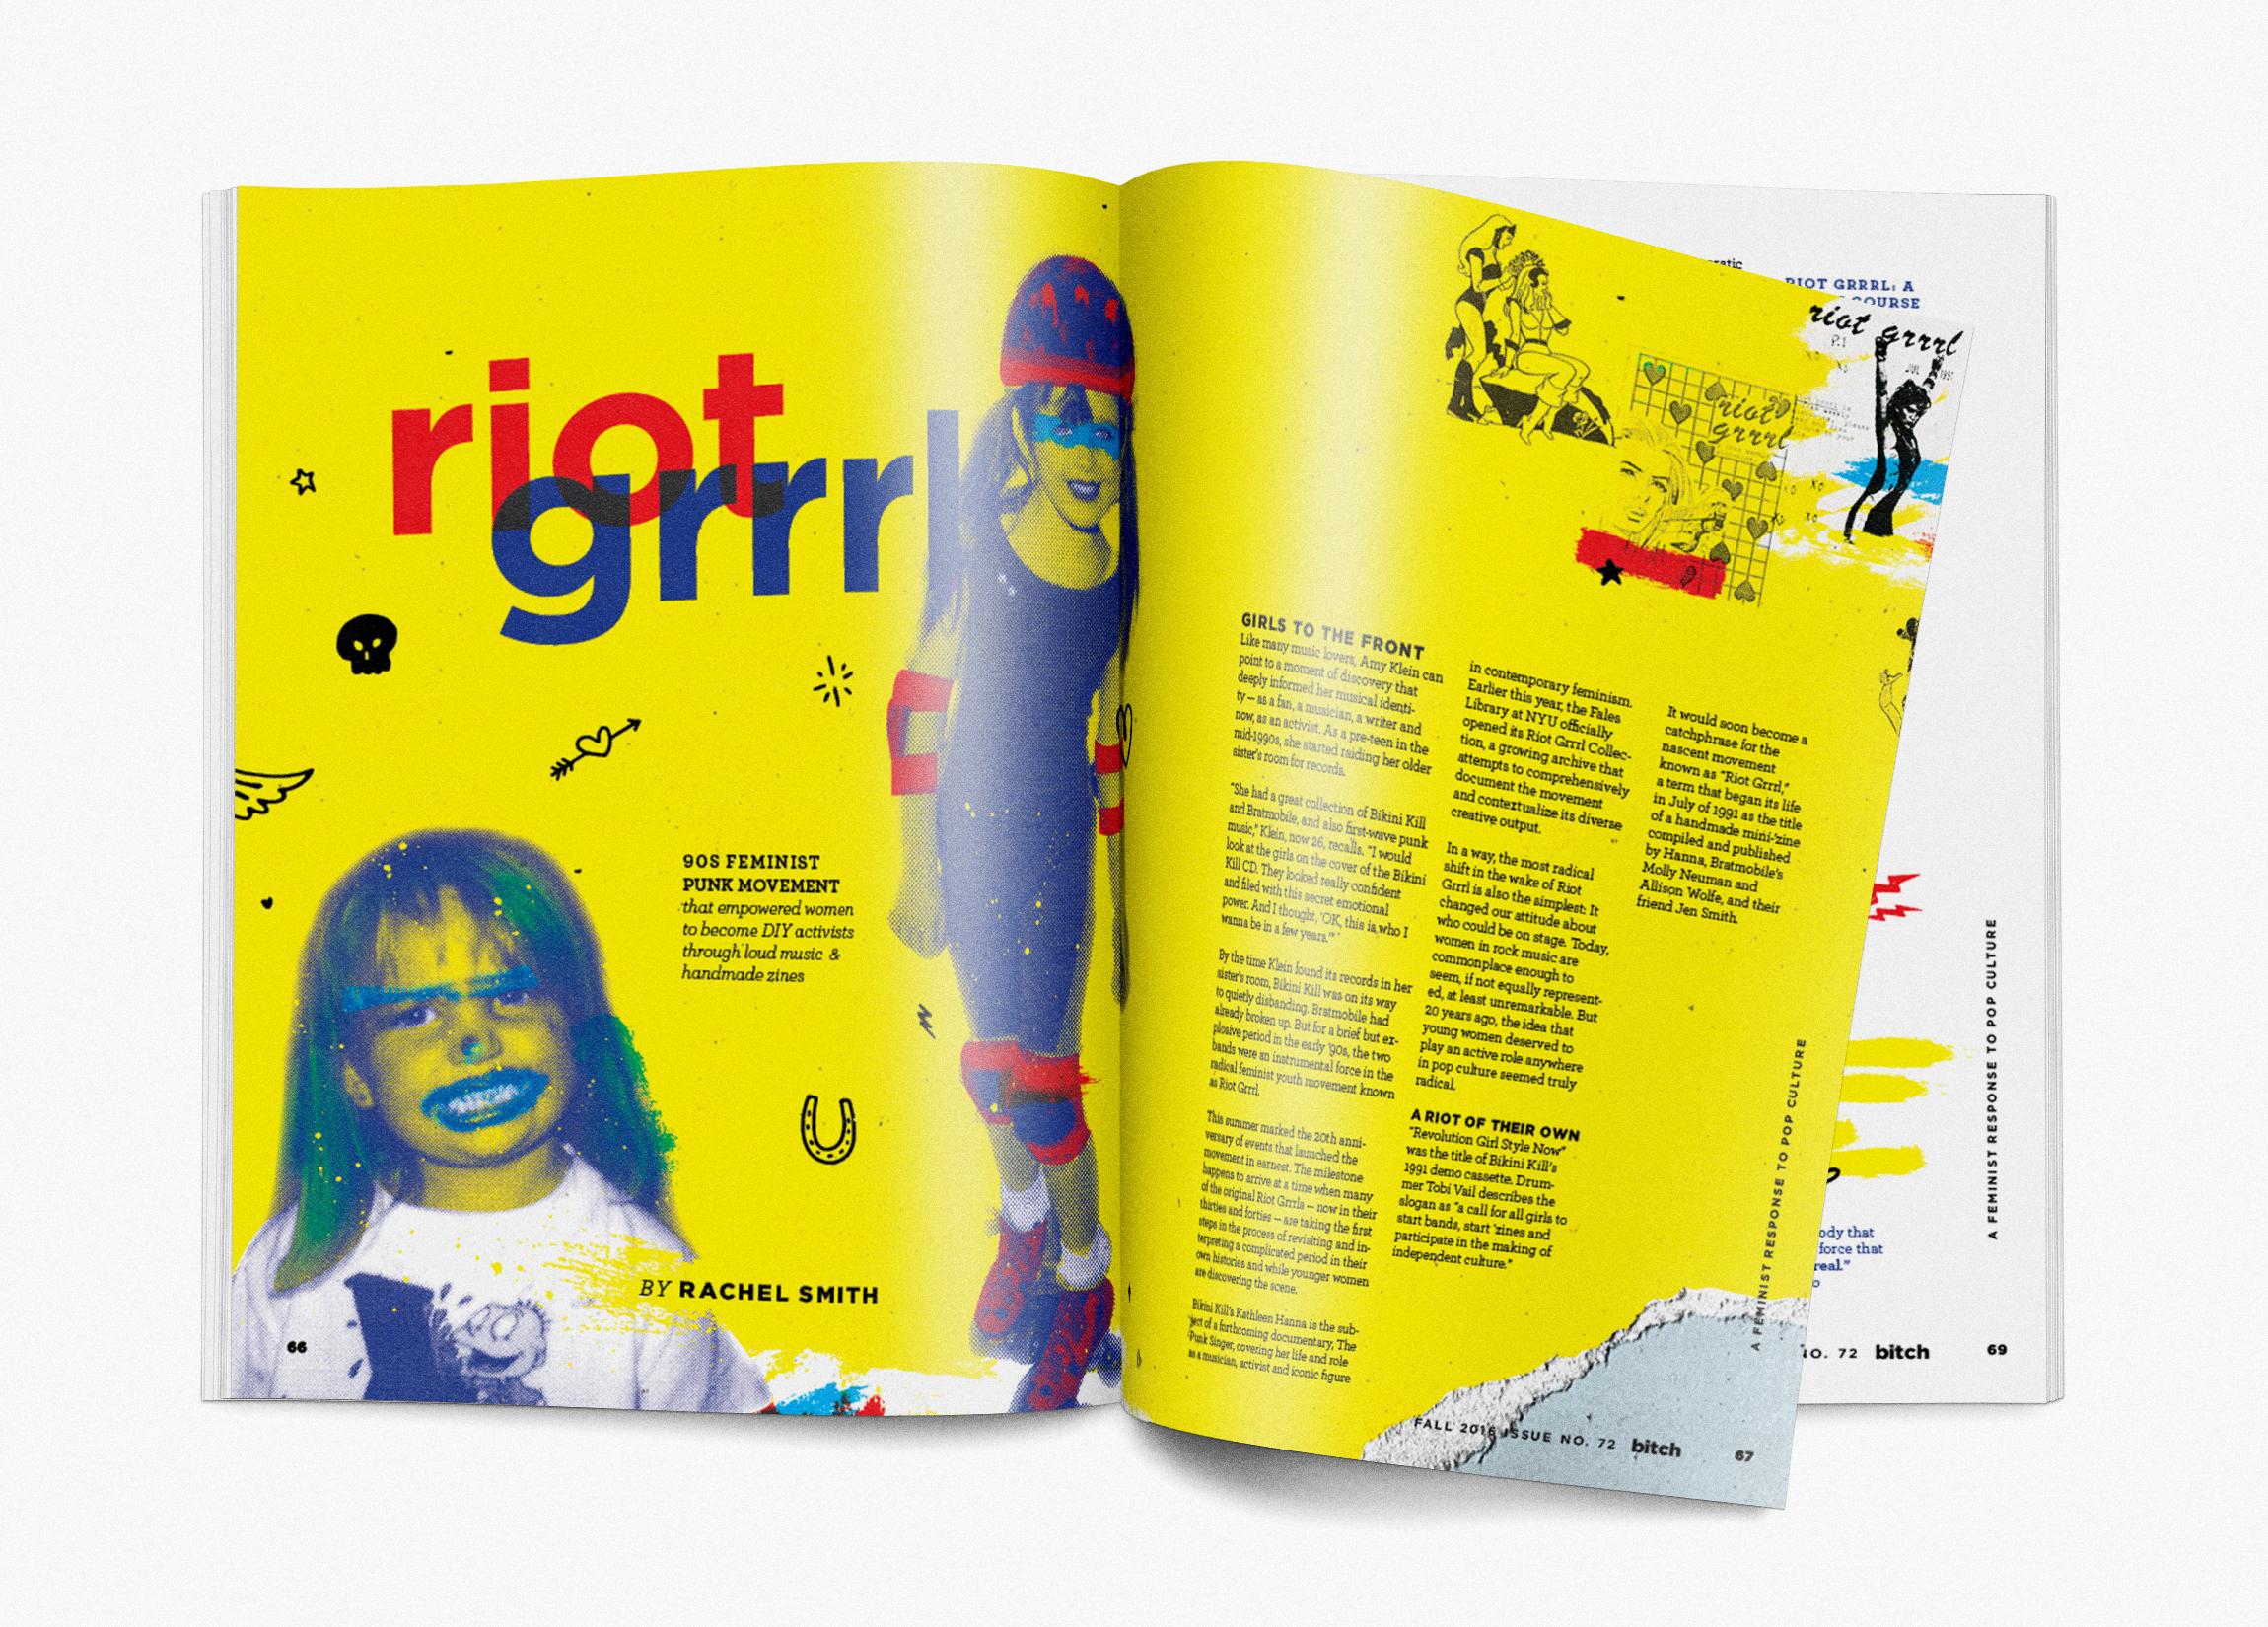 Photorealistic Magazine MockUp-riotgrrrl-onwhite.jpg